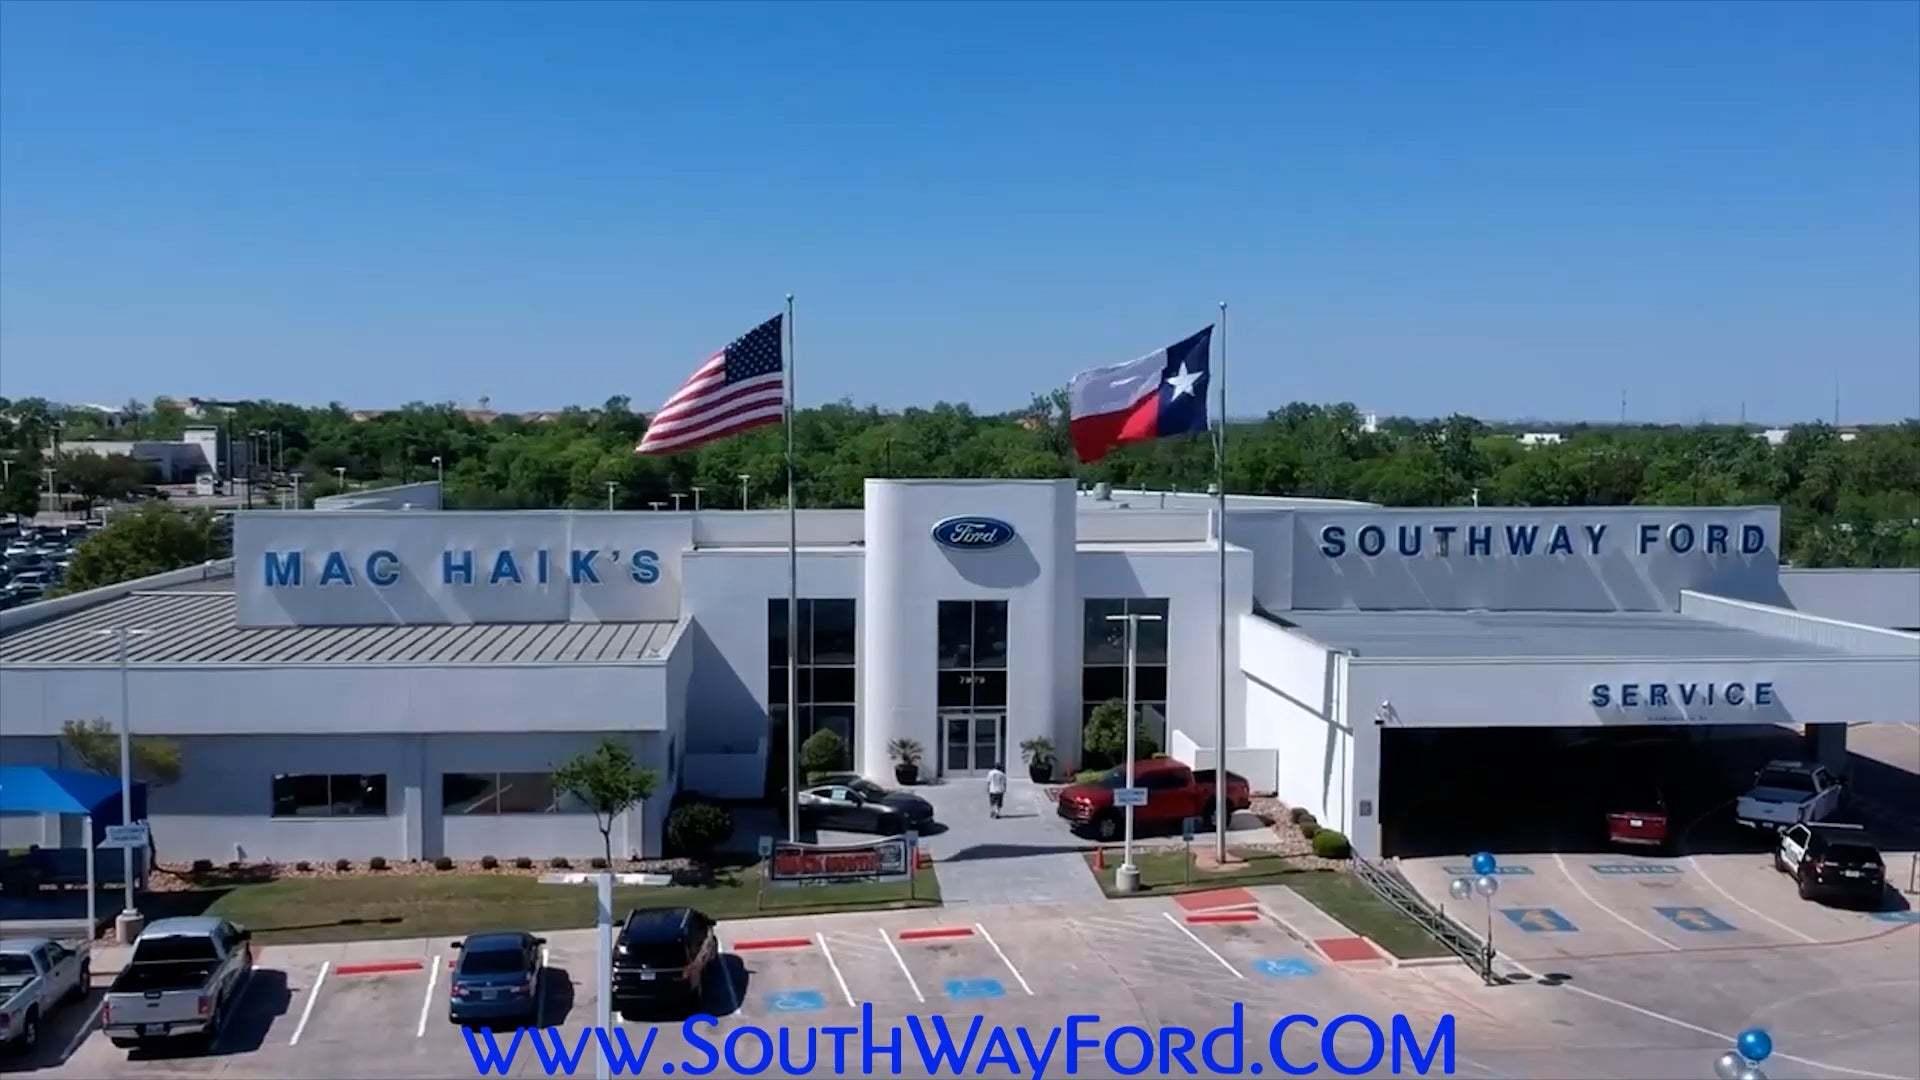 Mac Haik Southway Ford